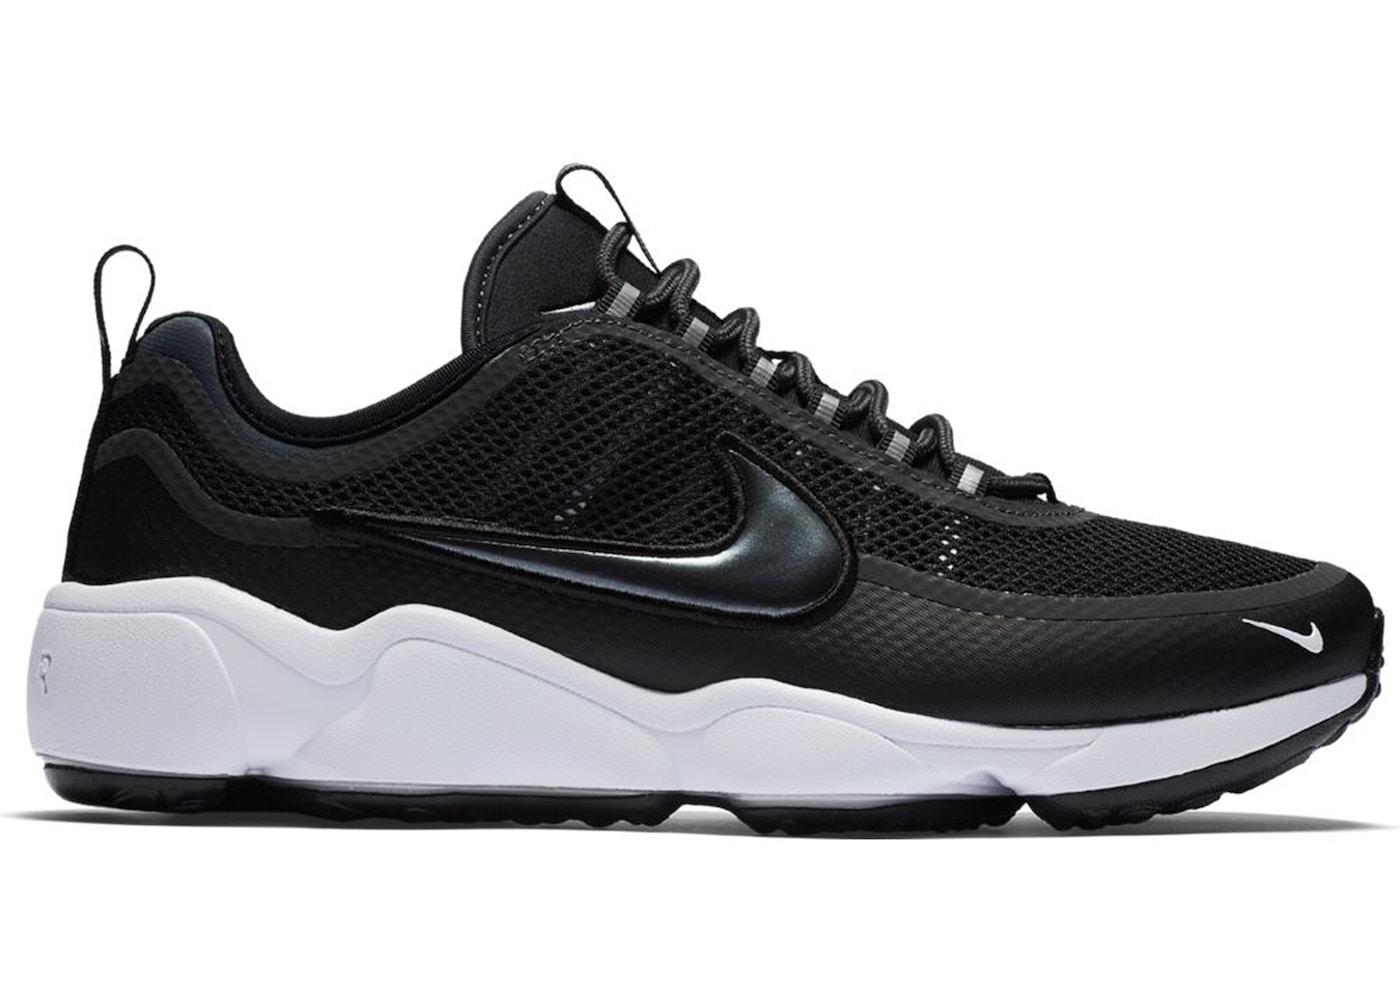 6af58381c9d020 Nike Air Max 97 Ultralight 2017 Sneaker in Metallic for Men Lyst